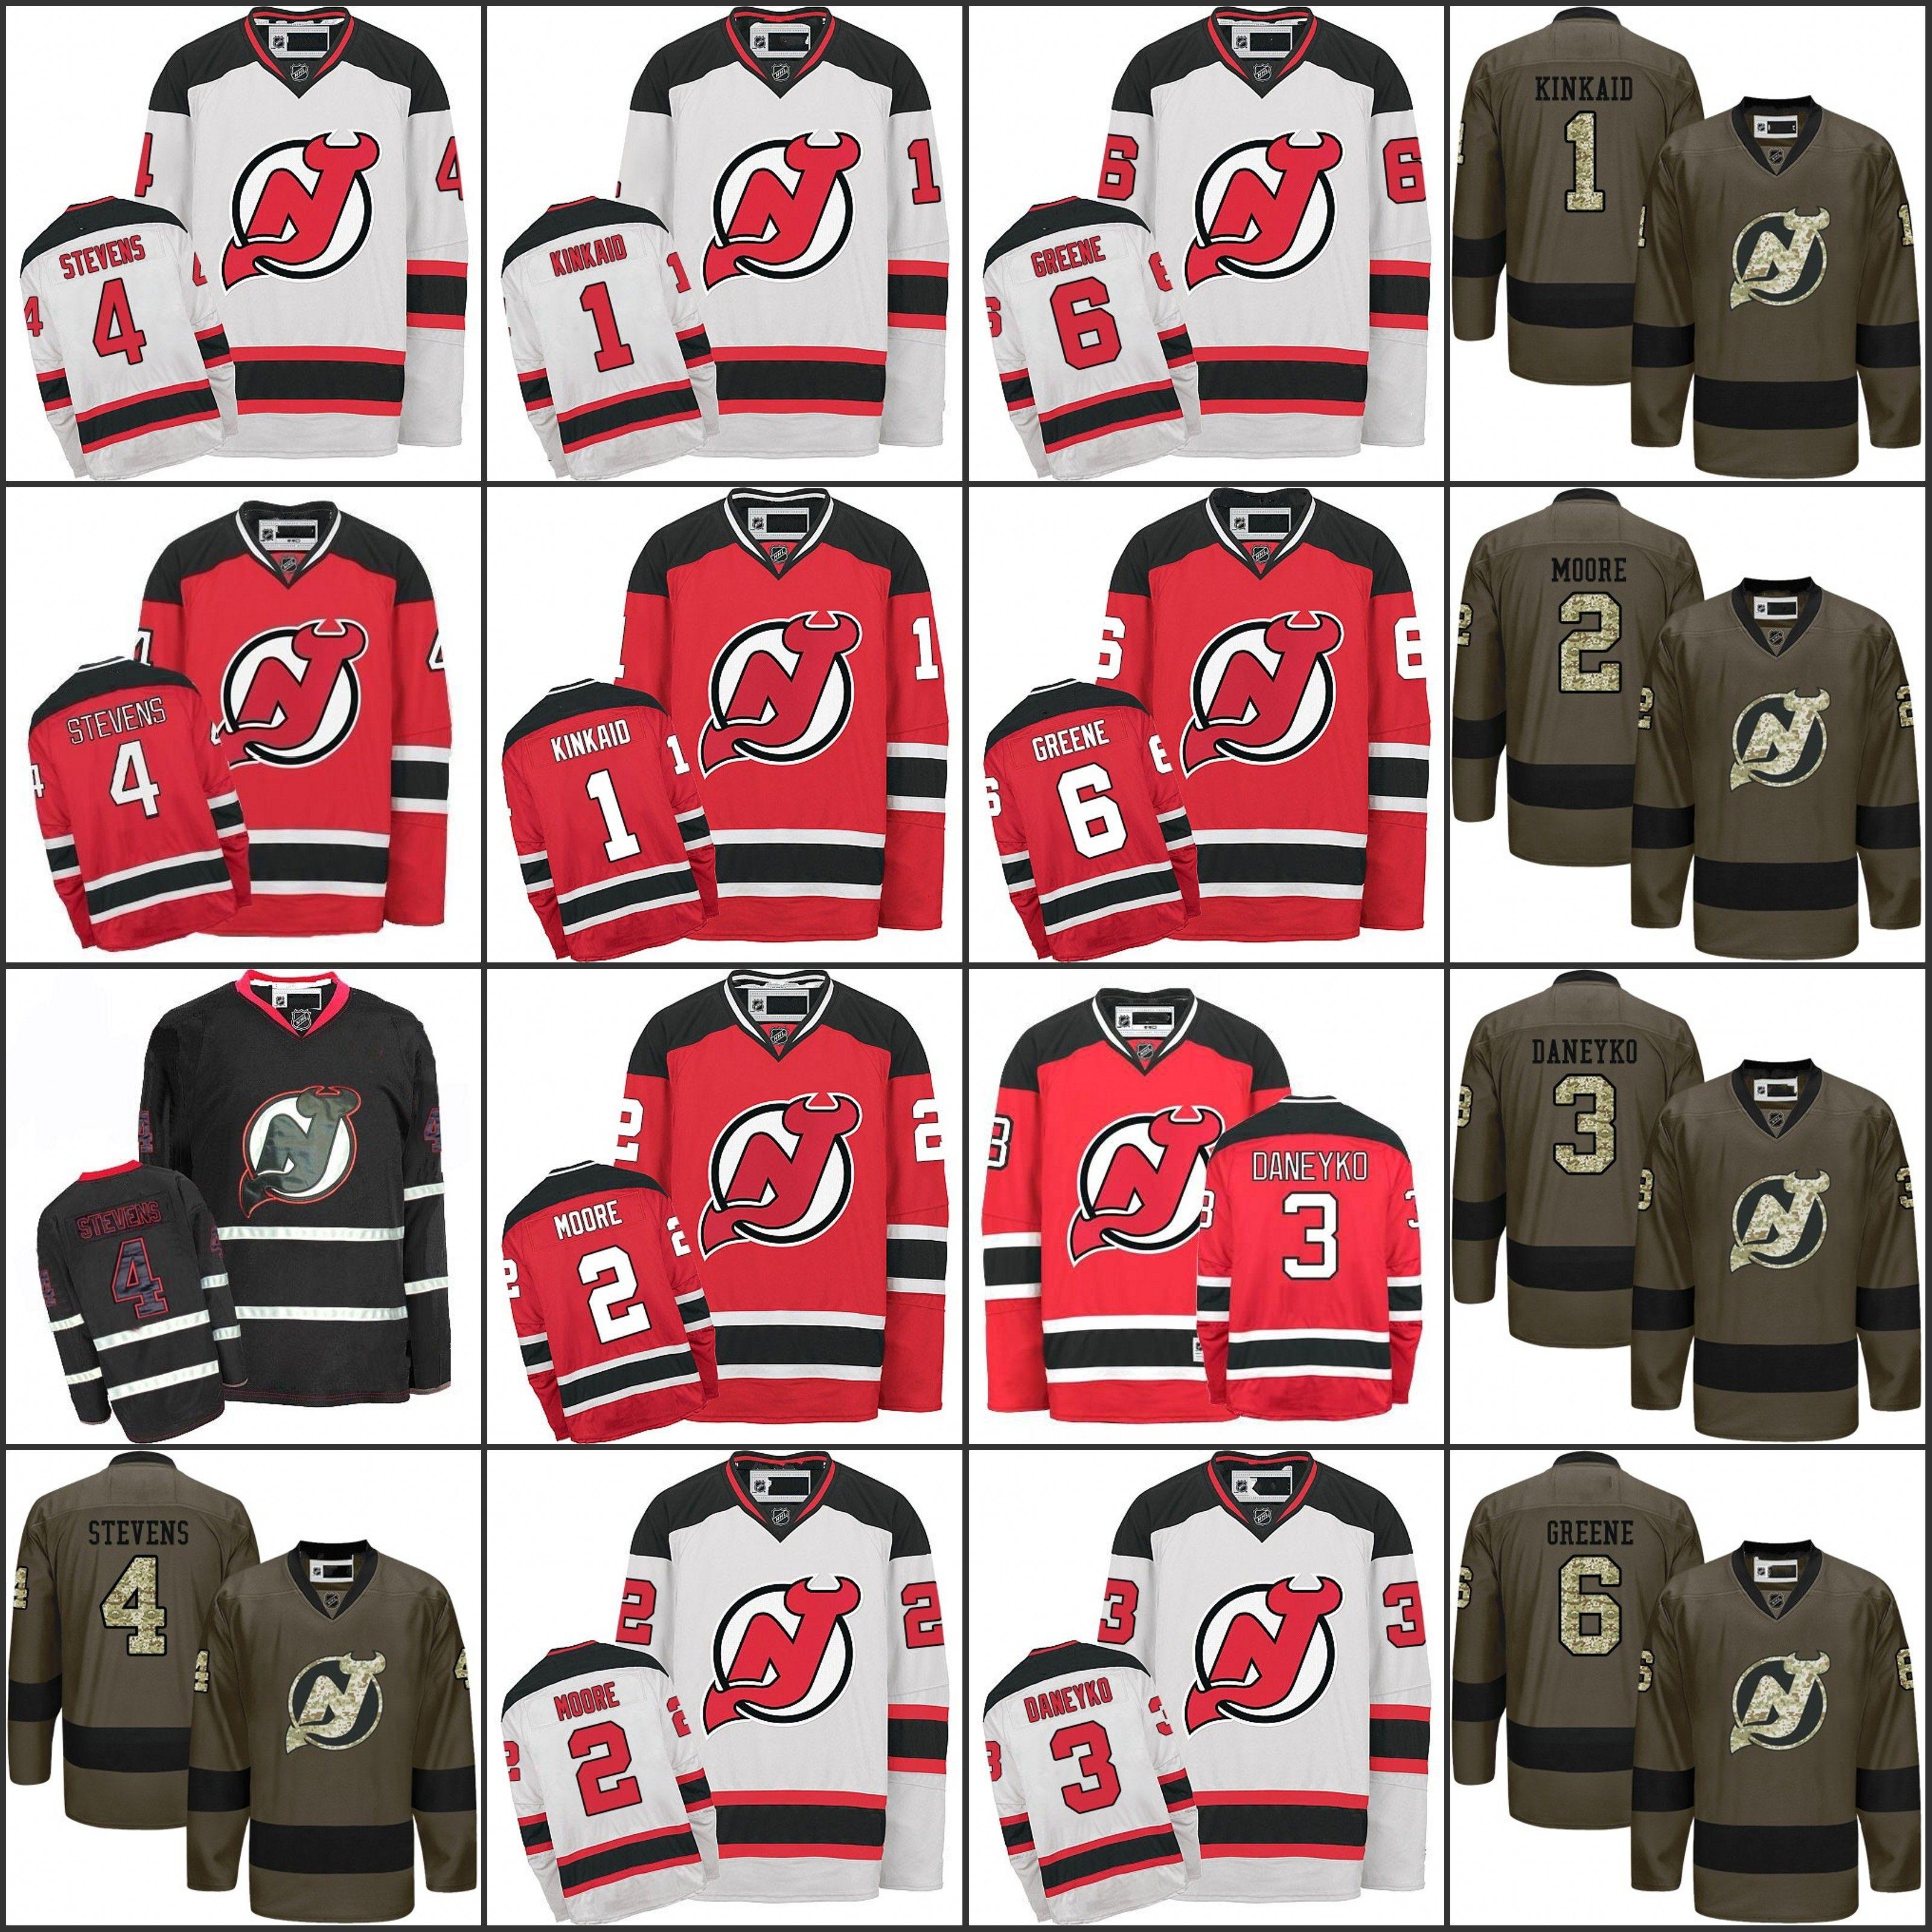 ... coupon code best 2017 mens new jersey devils 1 keith kinkaid 2 john  moore 3 ken ... 54845f376